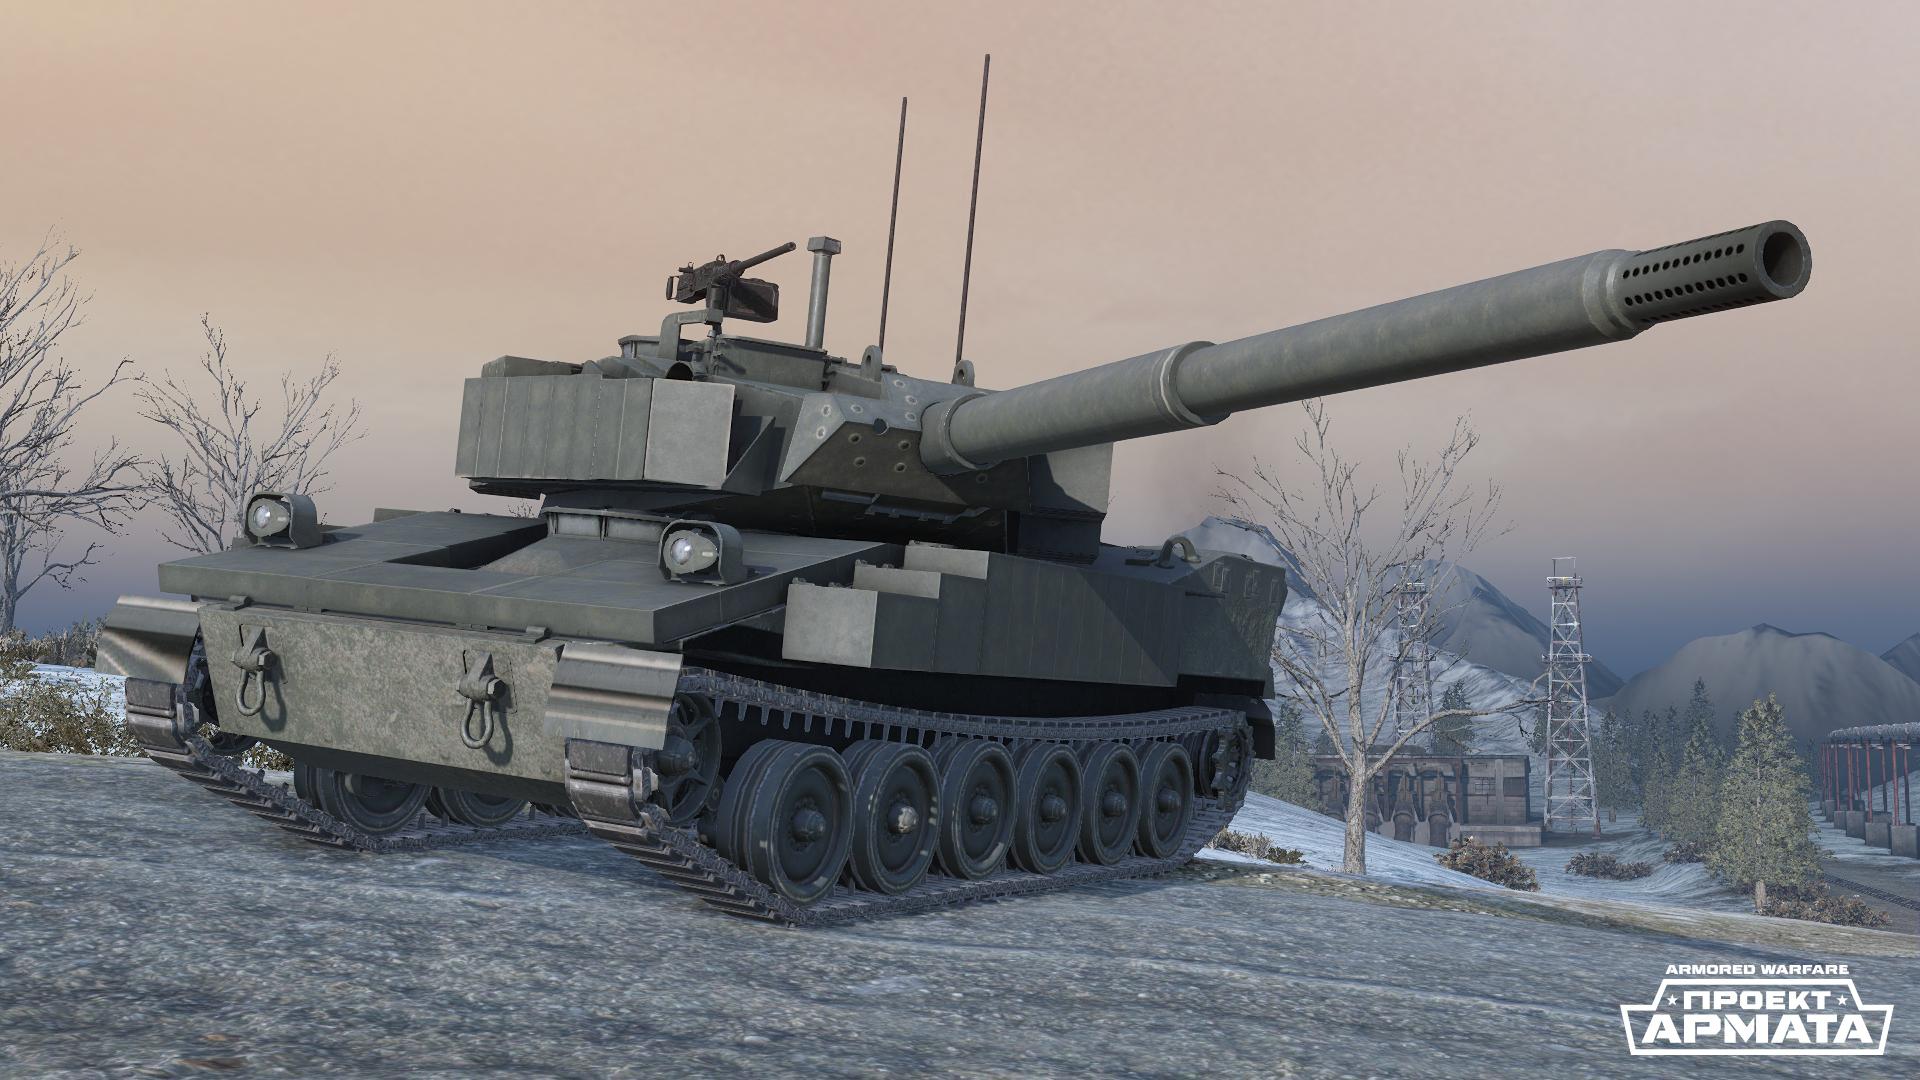 XM8, легкий танк 8 уровня